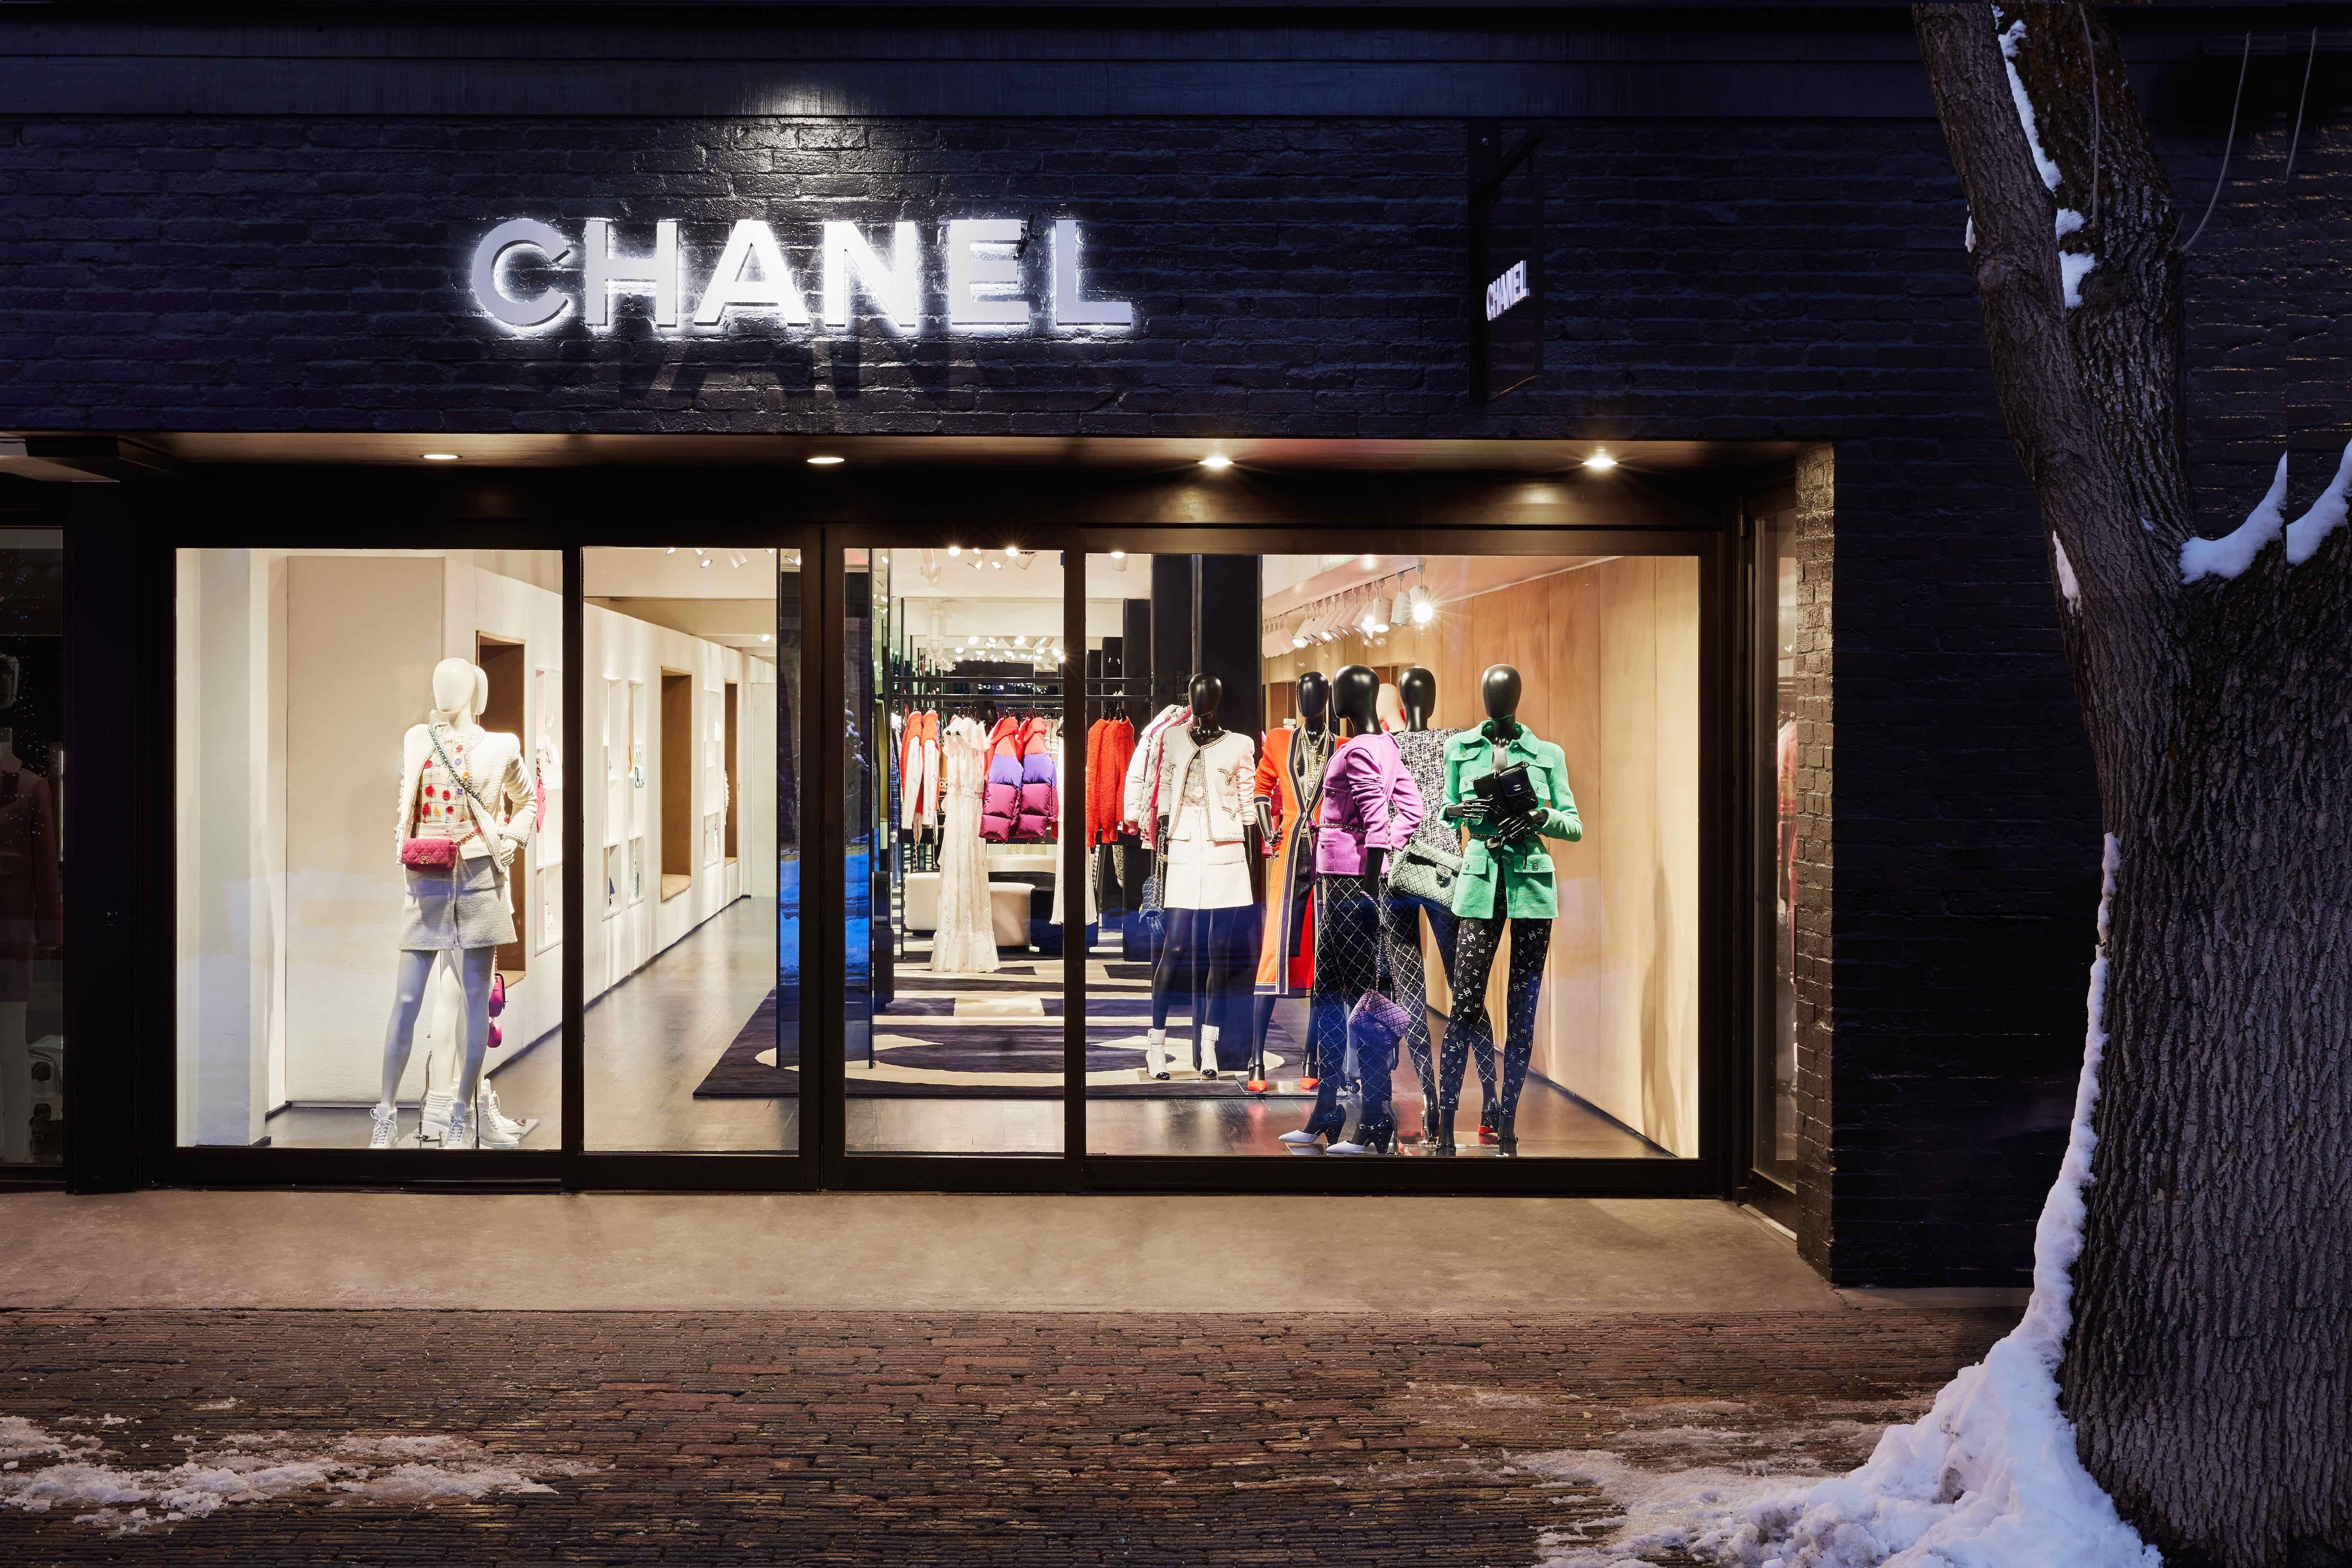 Chanel Opens Mountainside Ephemeral Boutique in Aspen